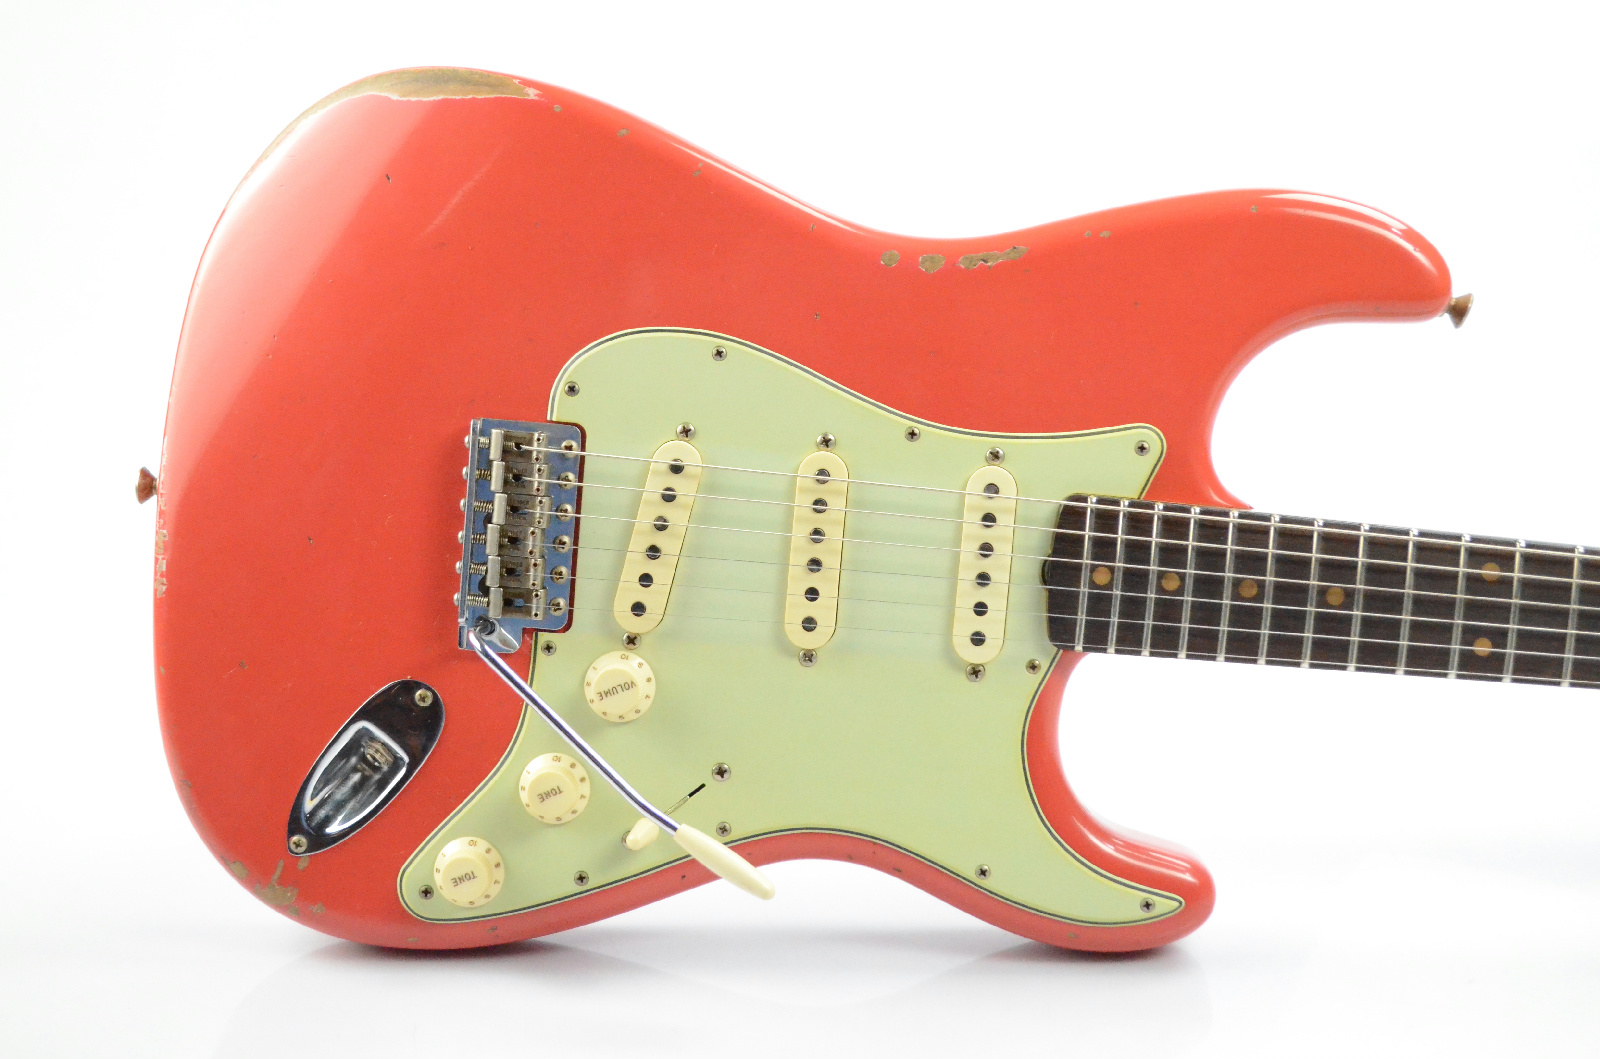 2018 Fender 1960 Stratocaster Relic Custom Shop Strat Aged Fiesta Red 33658